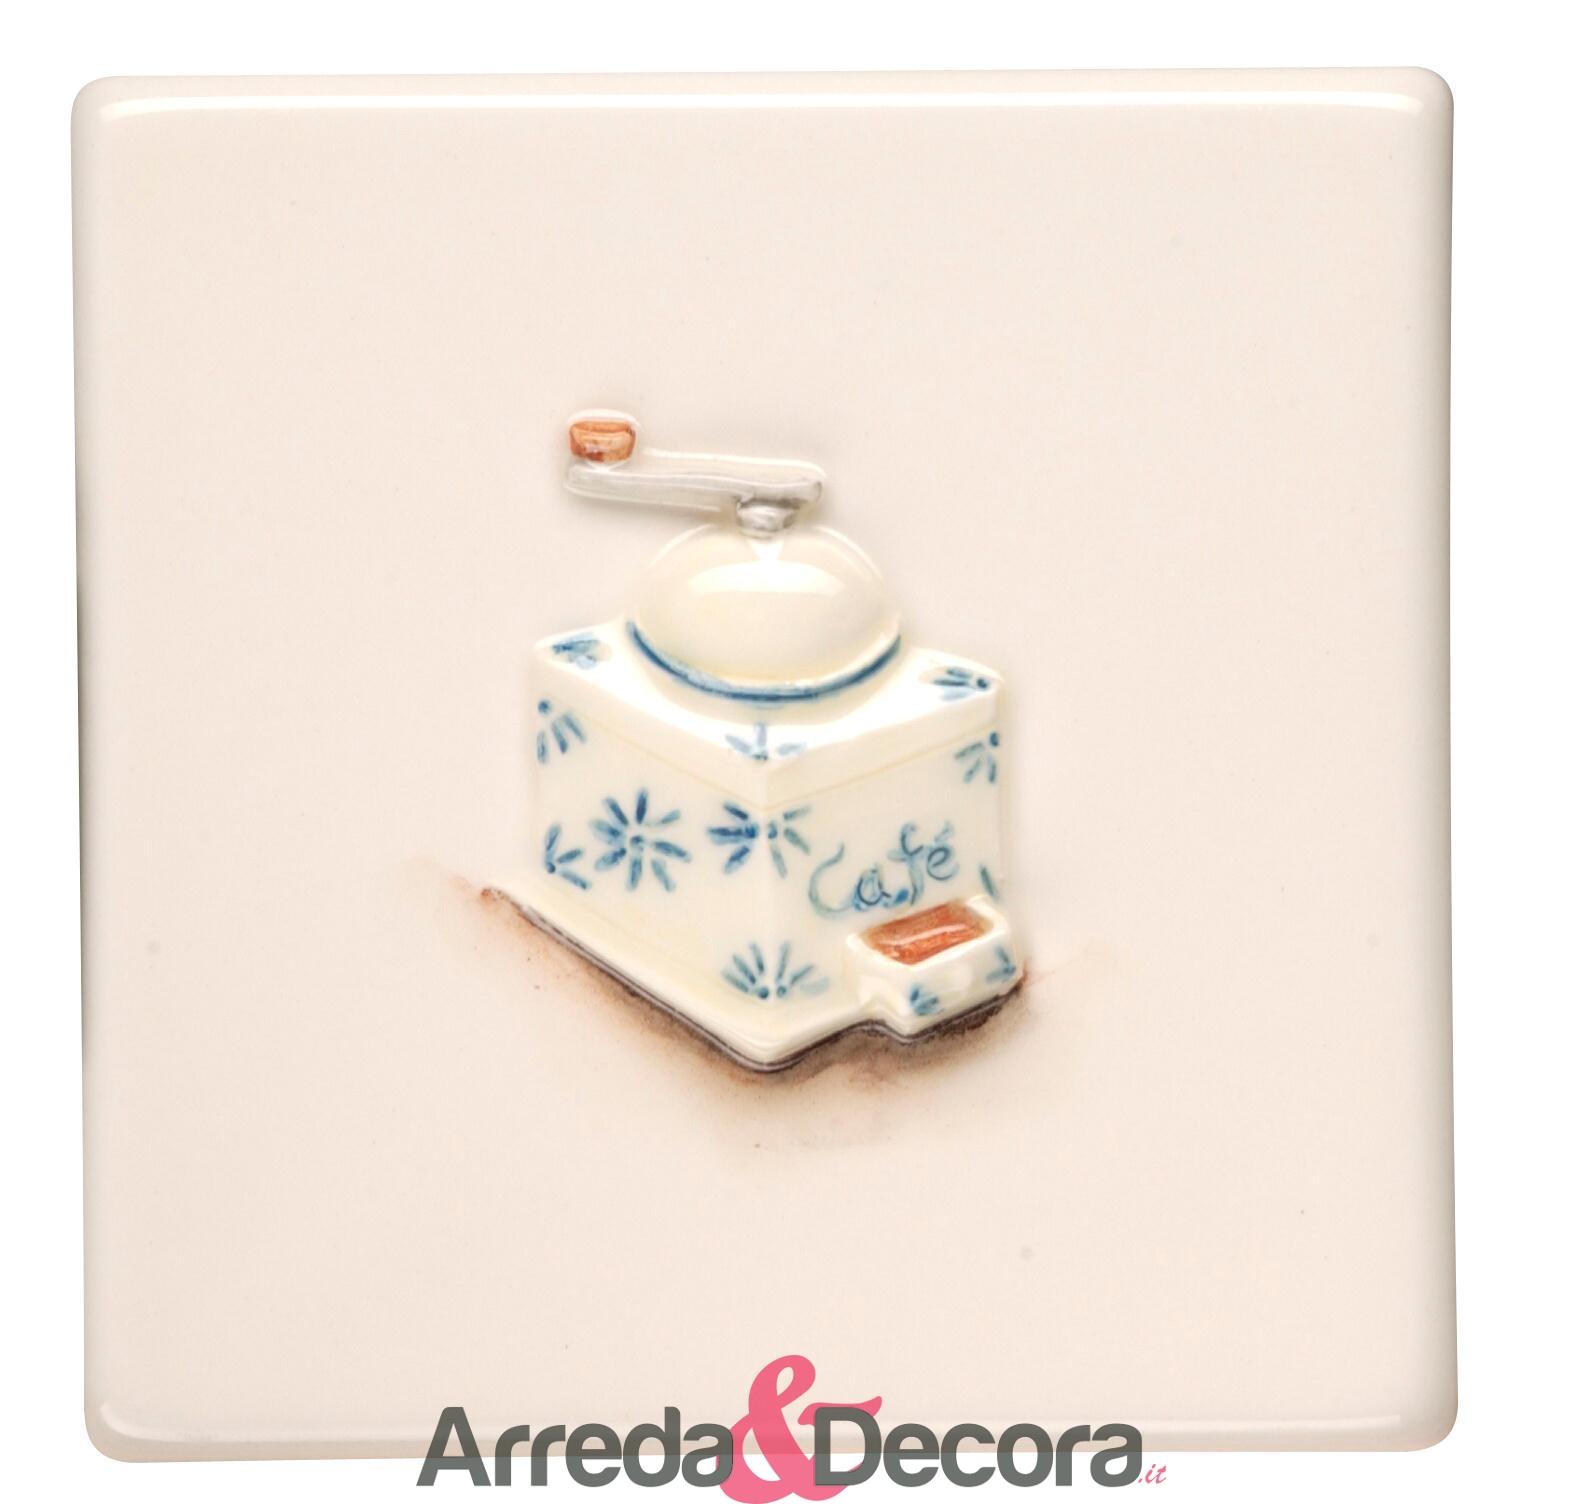 decoro-10x10-macinino-caffe